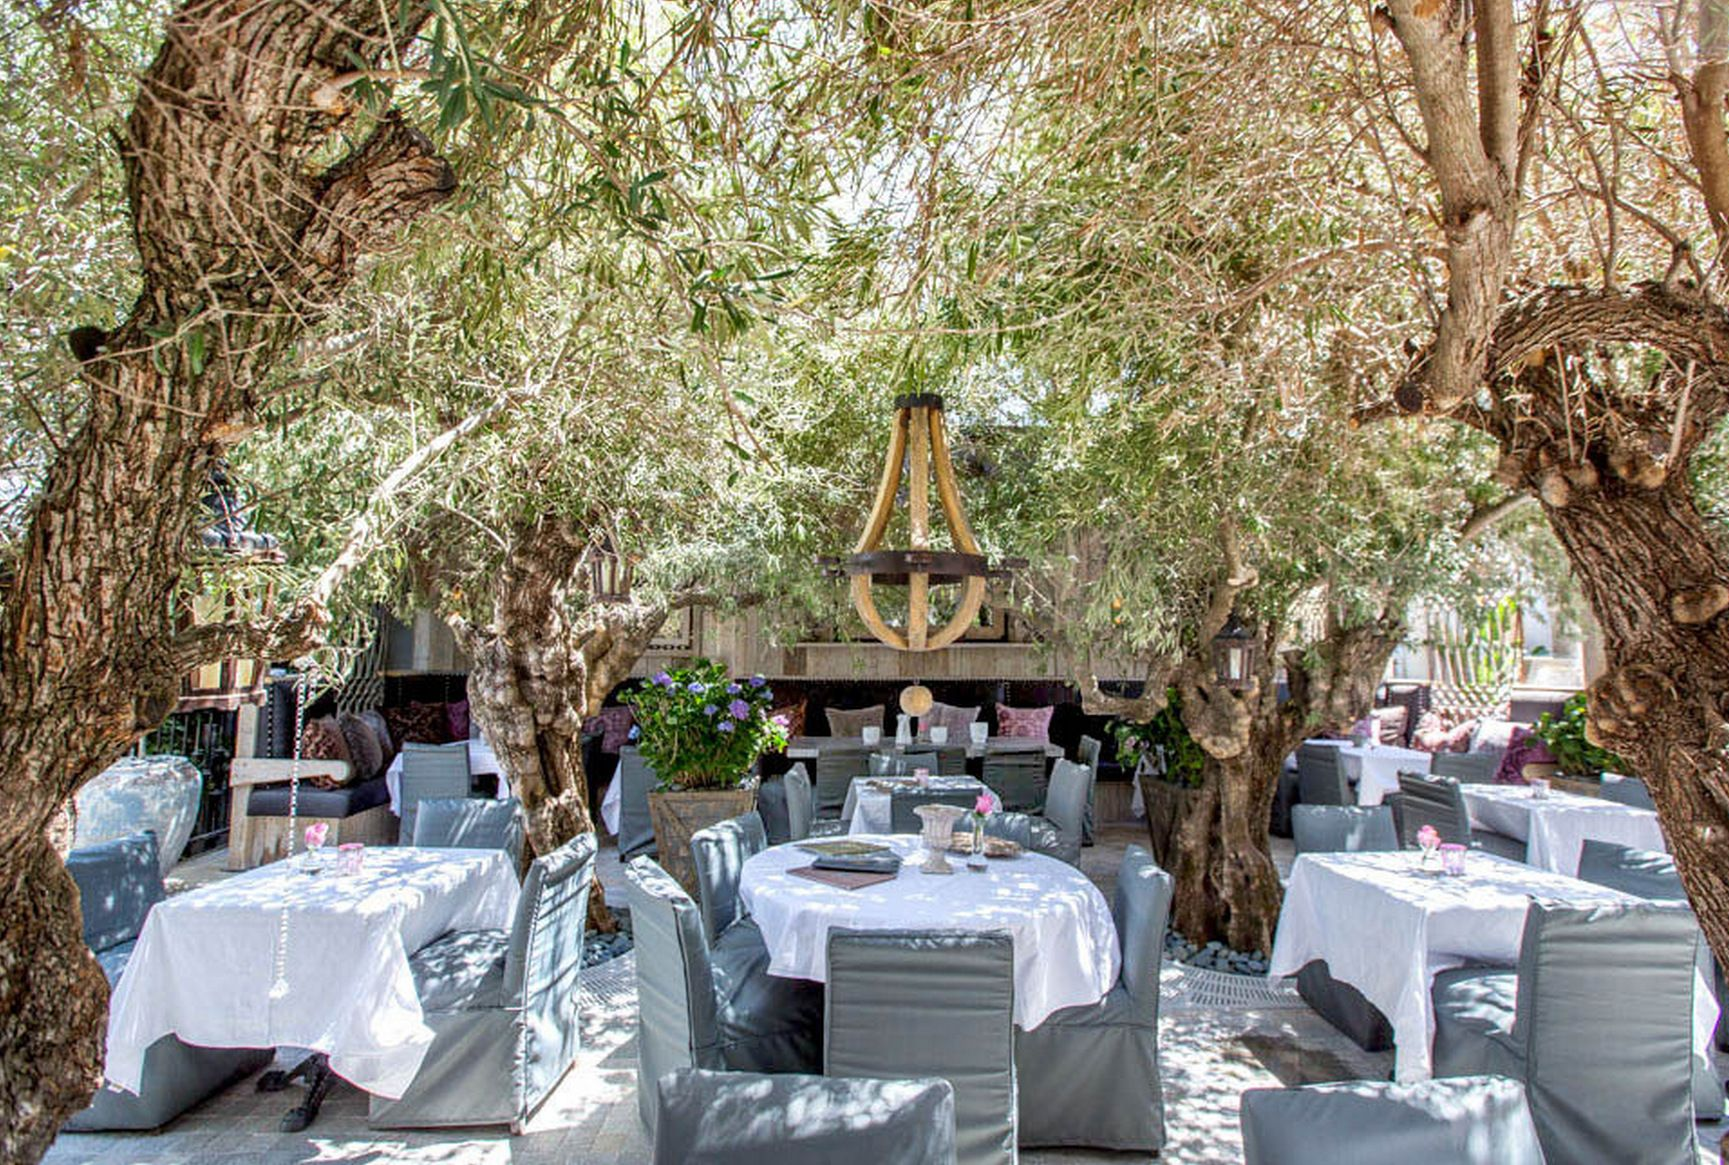 Outdoor Dining Restaurants In Los Angeles, Spring 2017